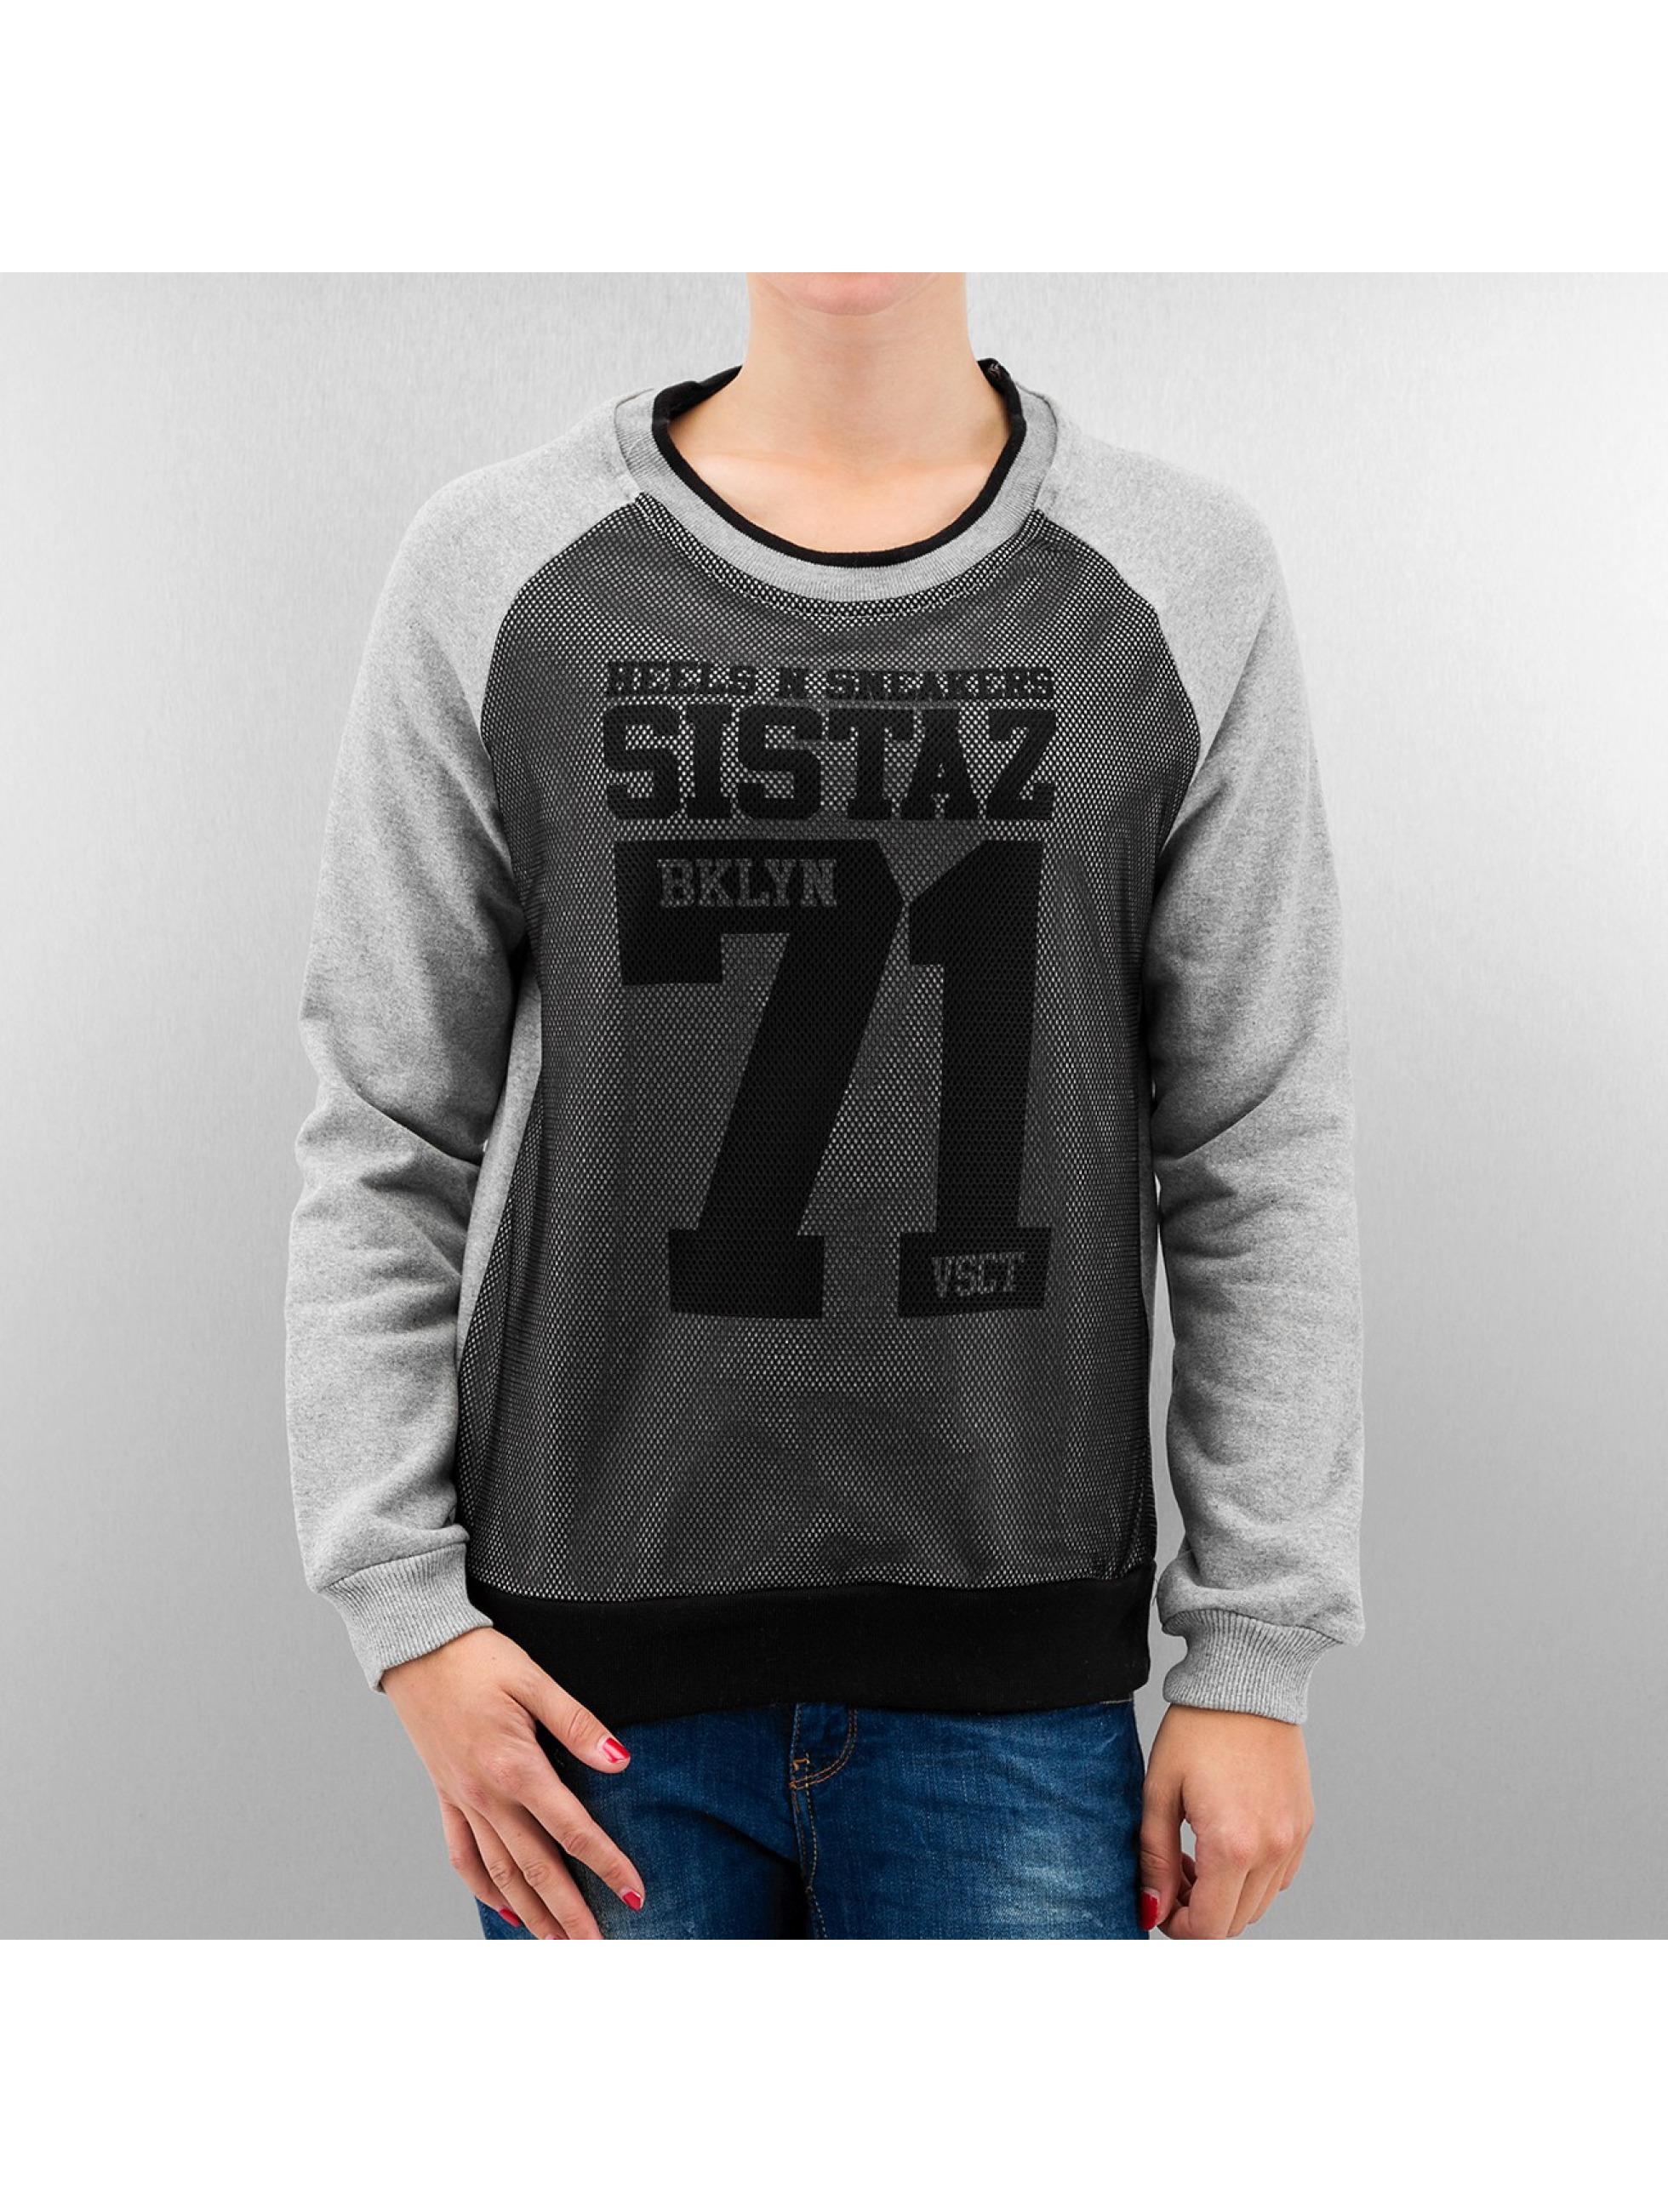 VSCT Clubwear Frauen Pullover BKLYN Sistaz Mesh in grau